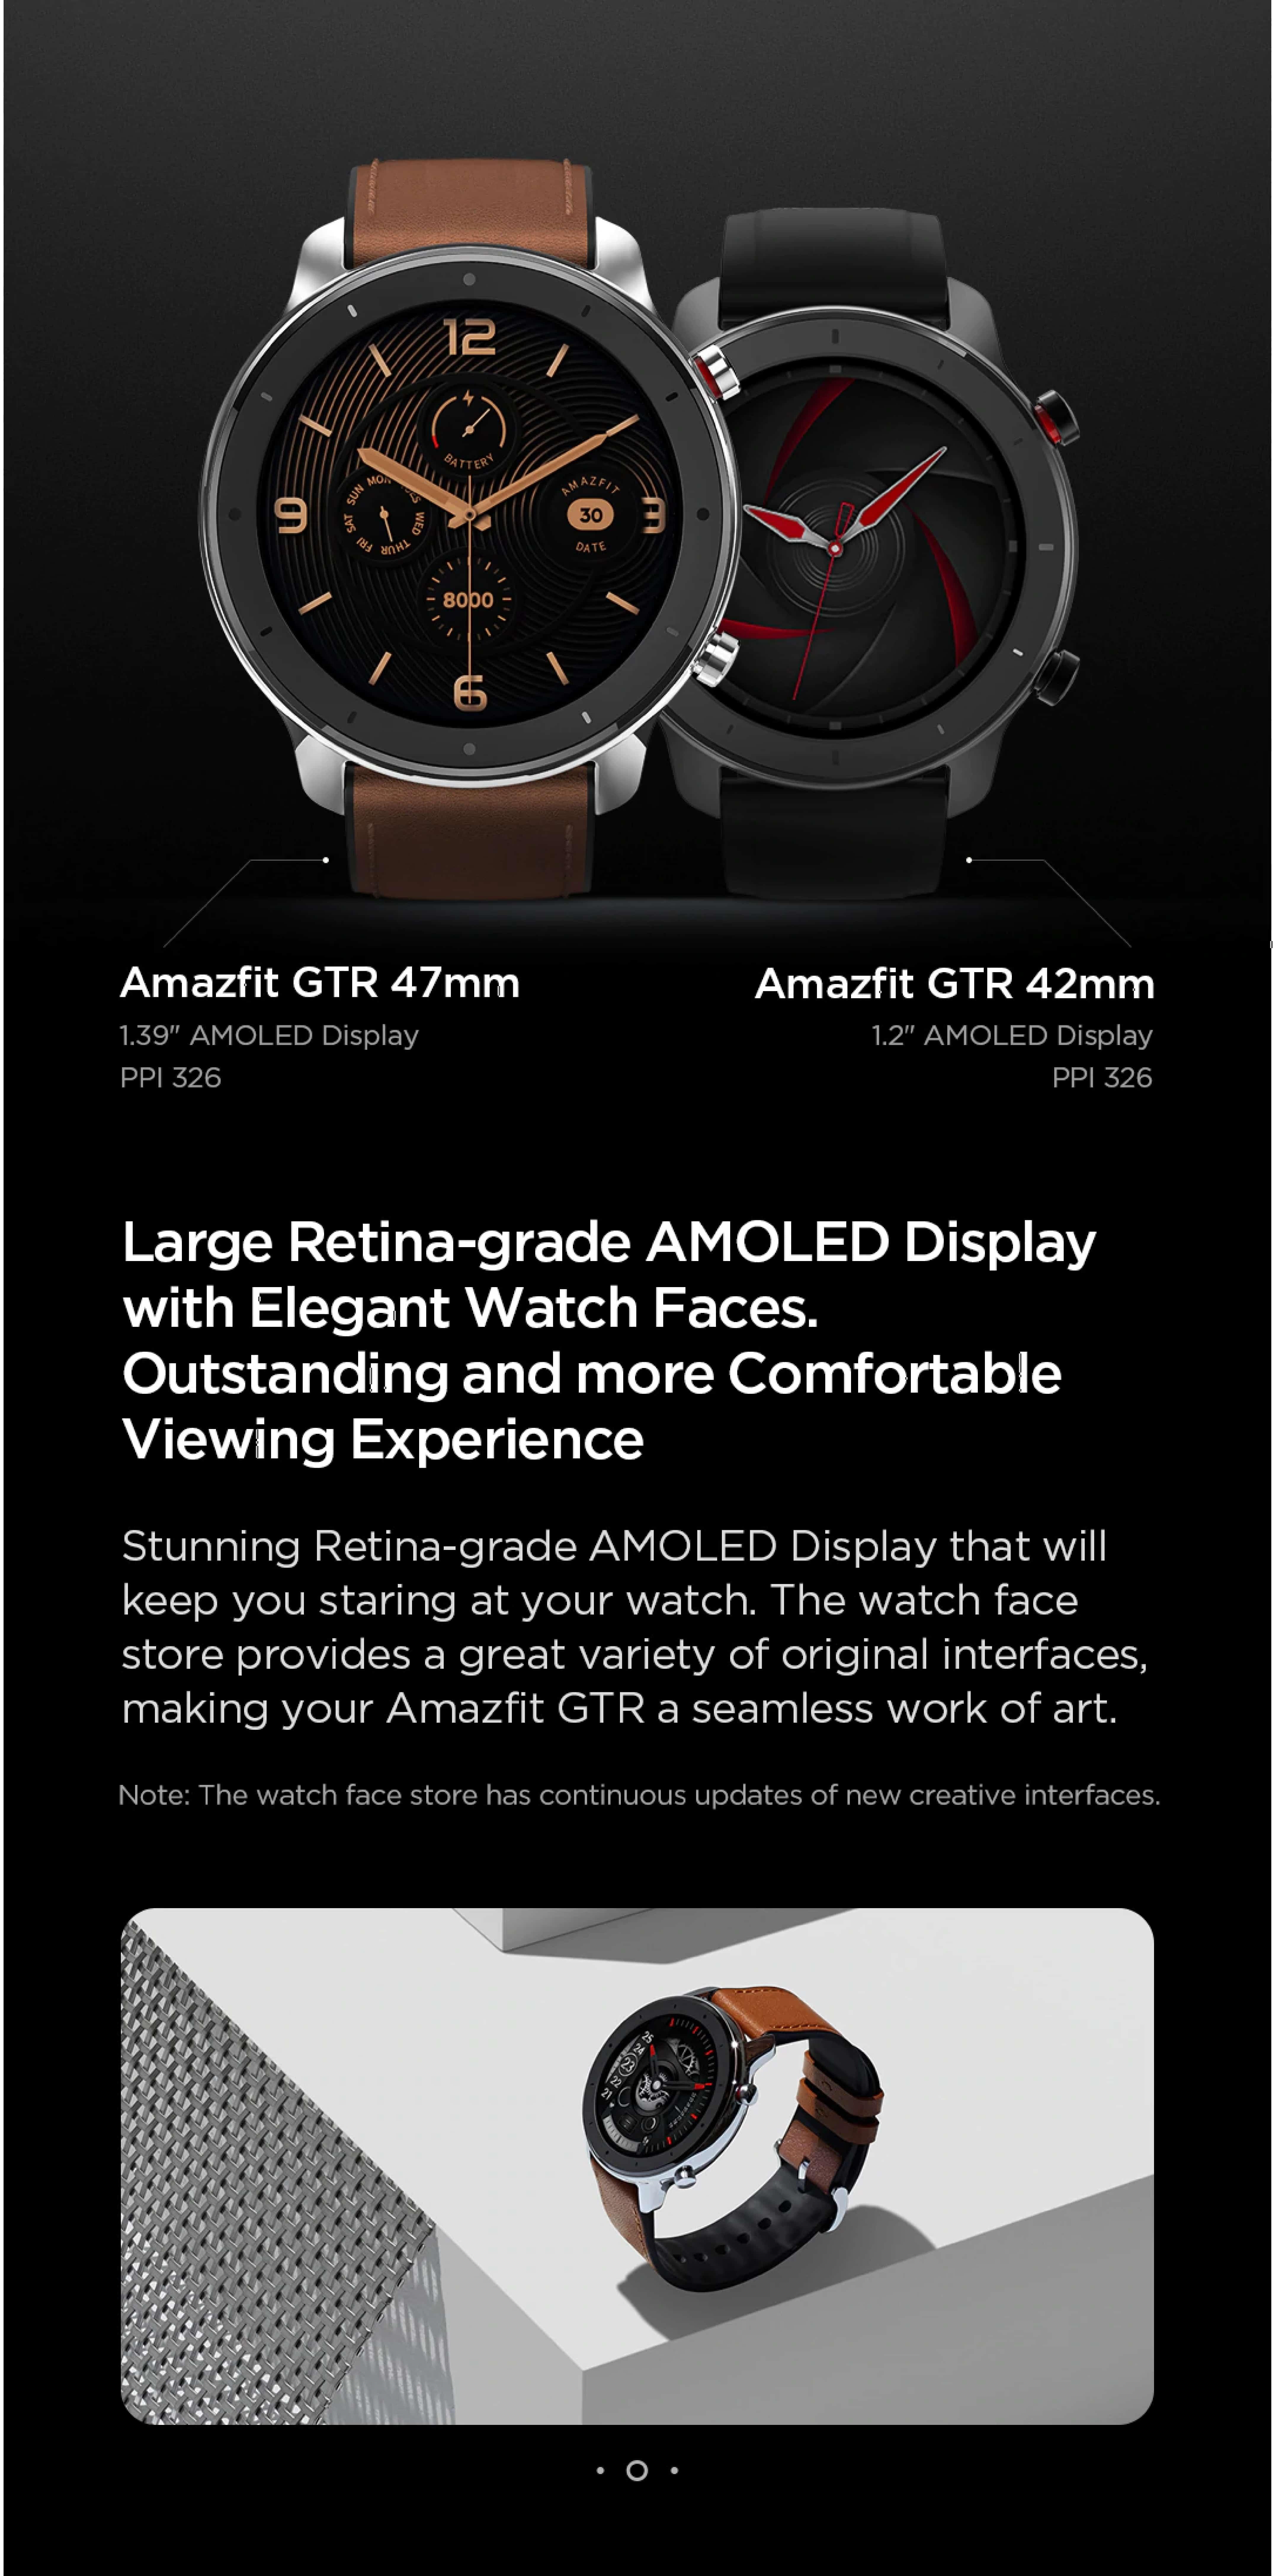 Amazfit GTR 42mm, multifunction watch, in malaysia, watch stylish, modern